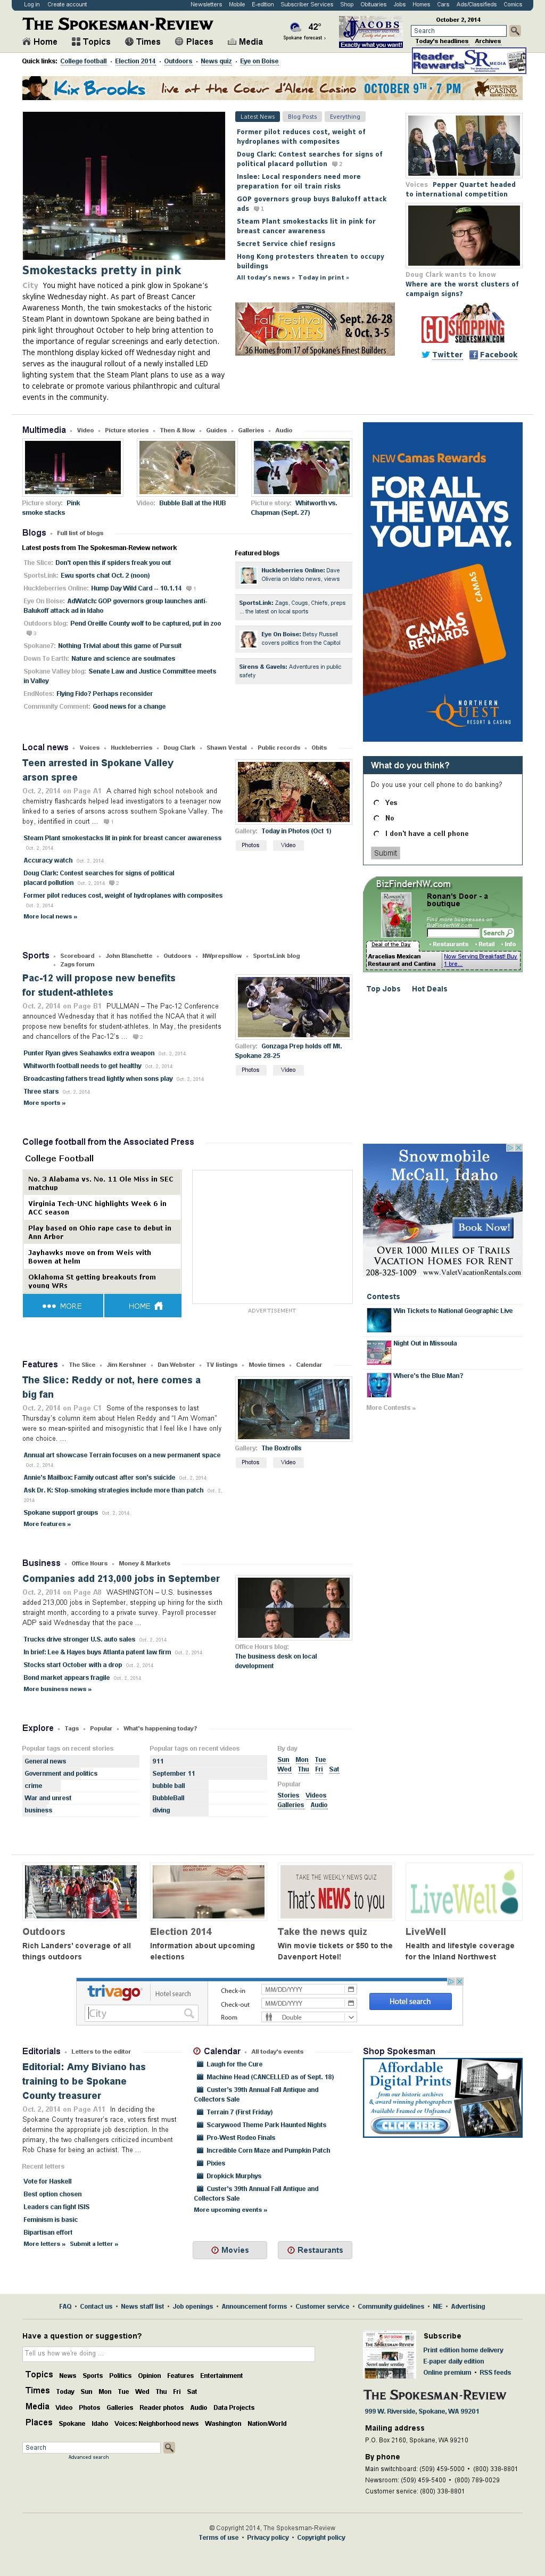 The (Spokane) Spokesman-Review at Thursday Oct. 2, 2014, 1:14 p.m. UTC